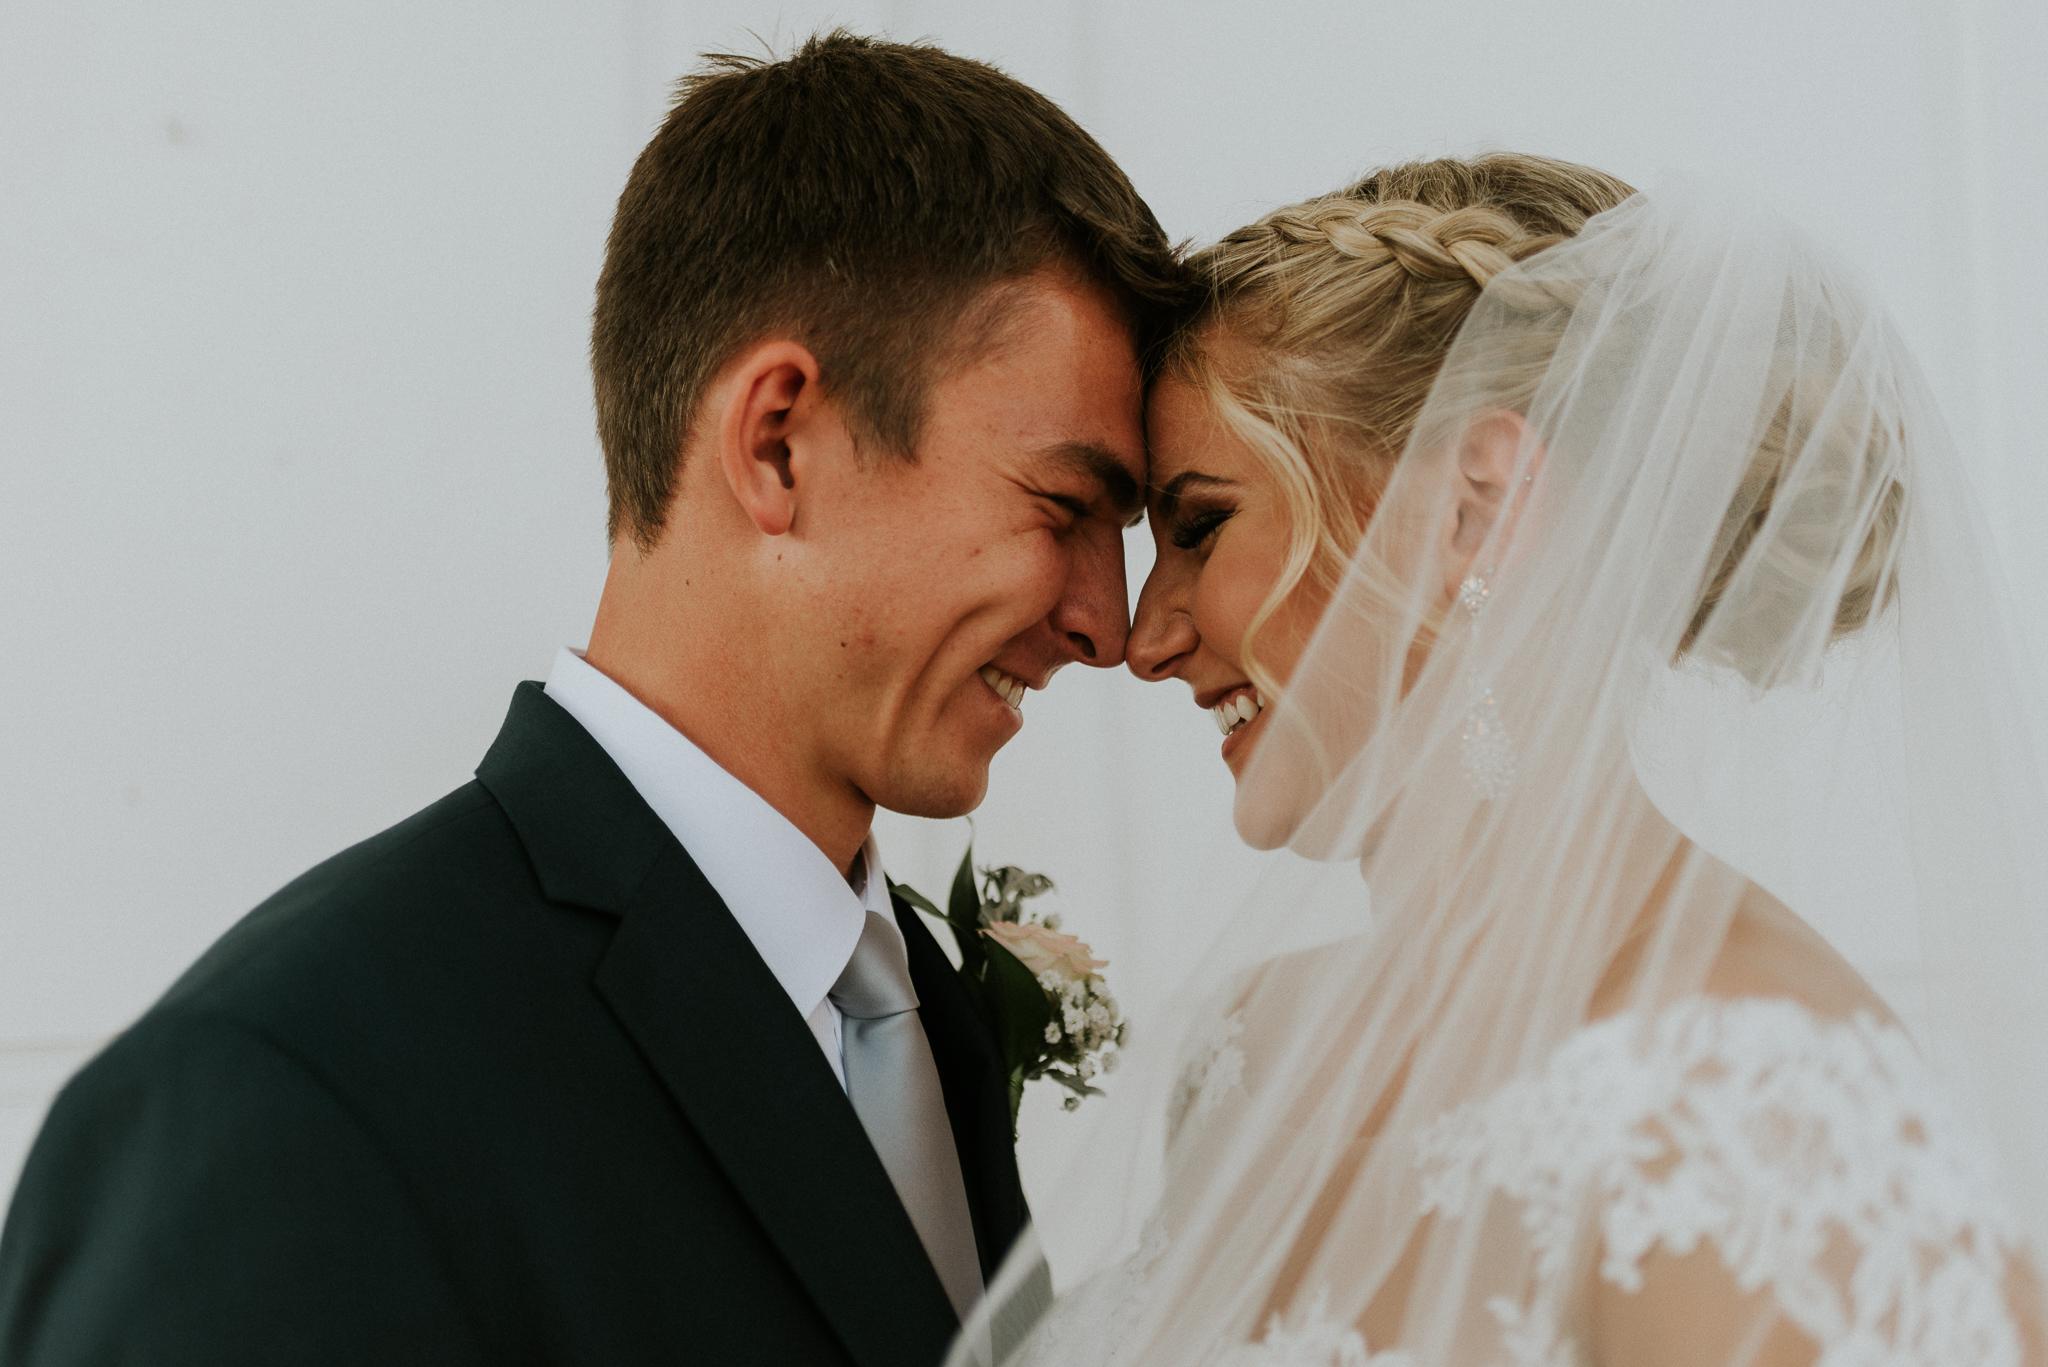 east-tn-wedding-photographer-tennessee-elopement-photographer-kingsport-tn-wedding-photographer (36 of 50).jpg